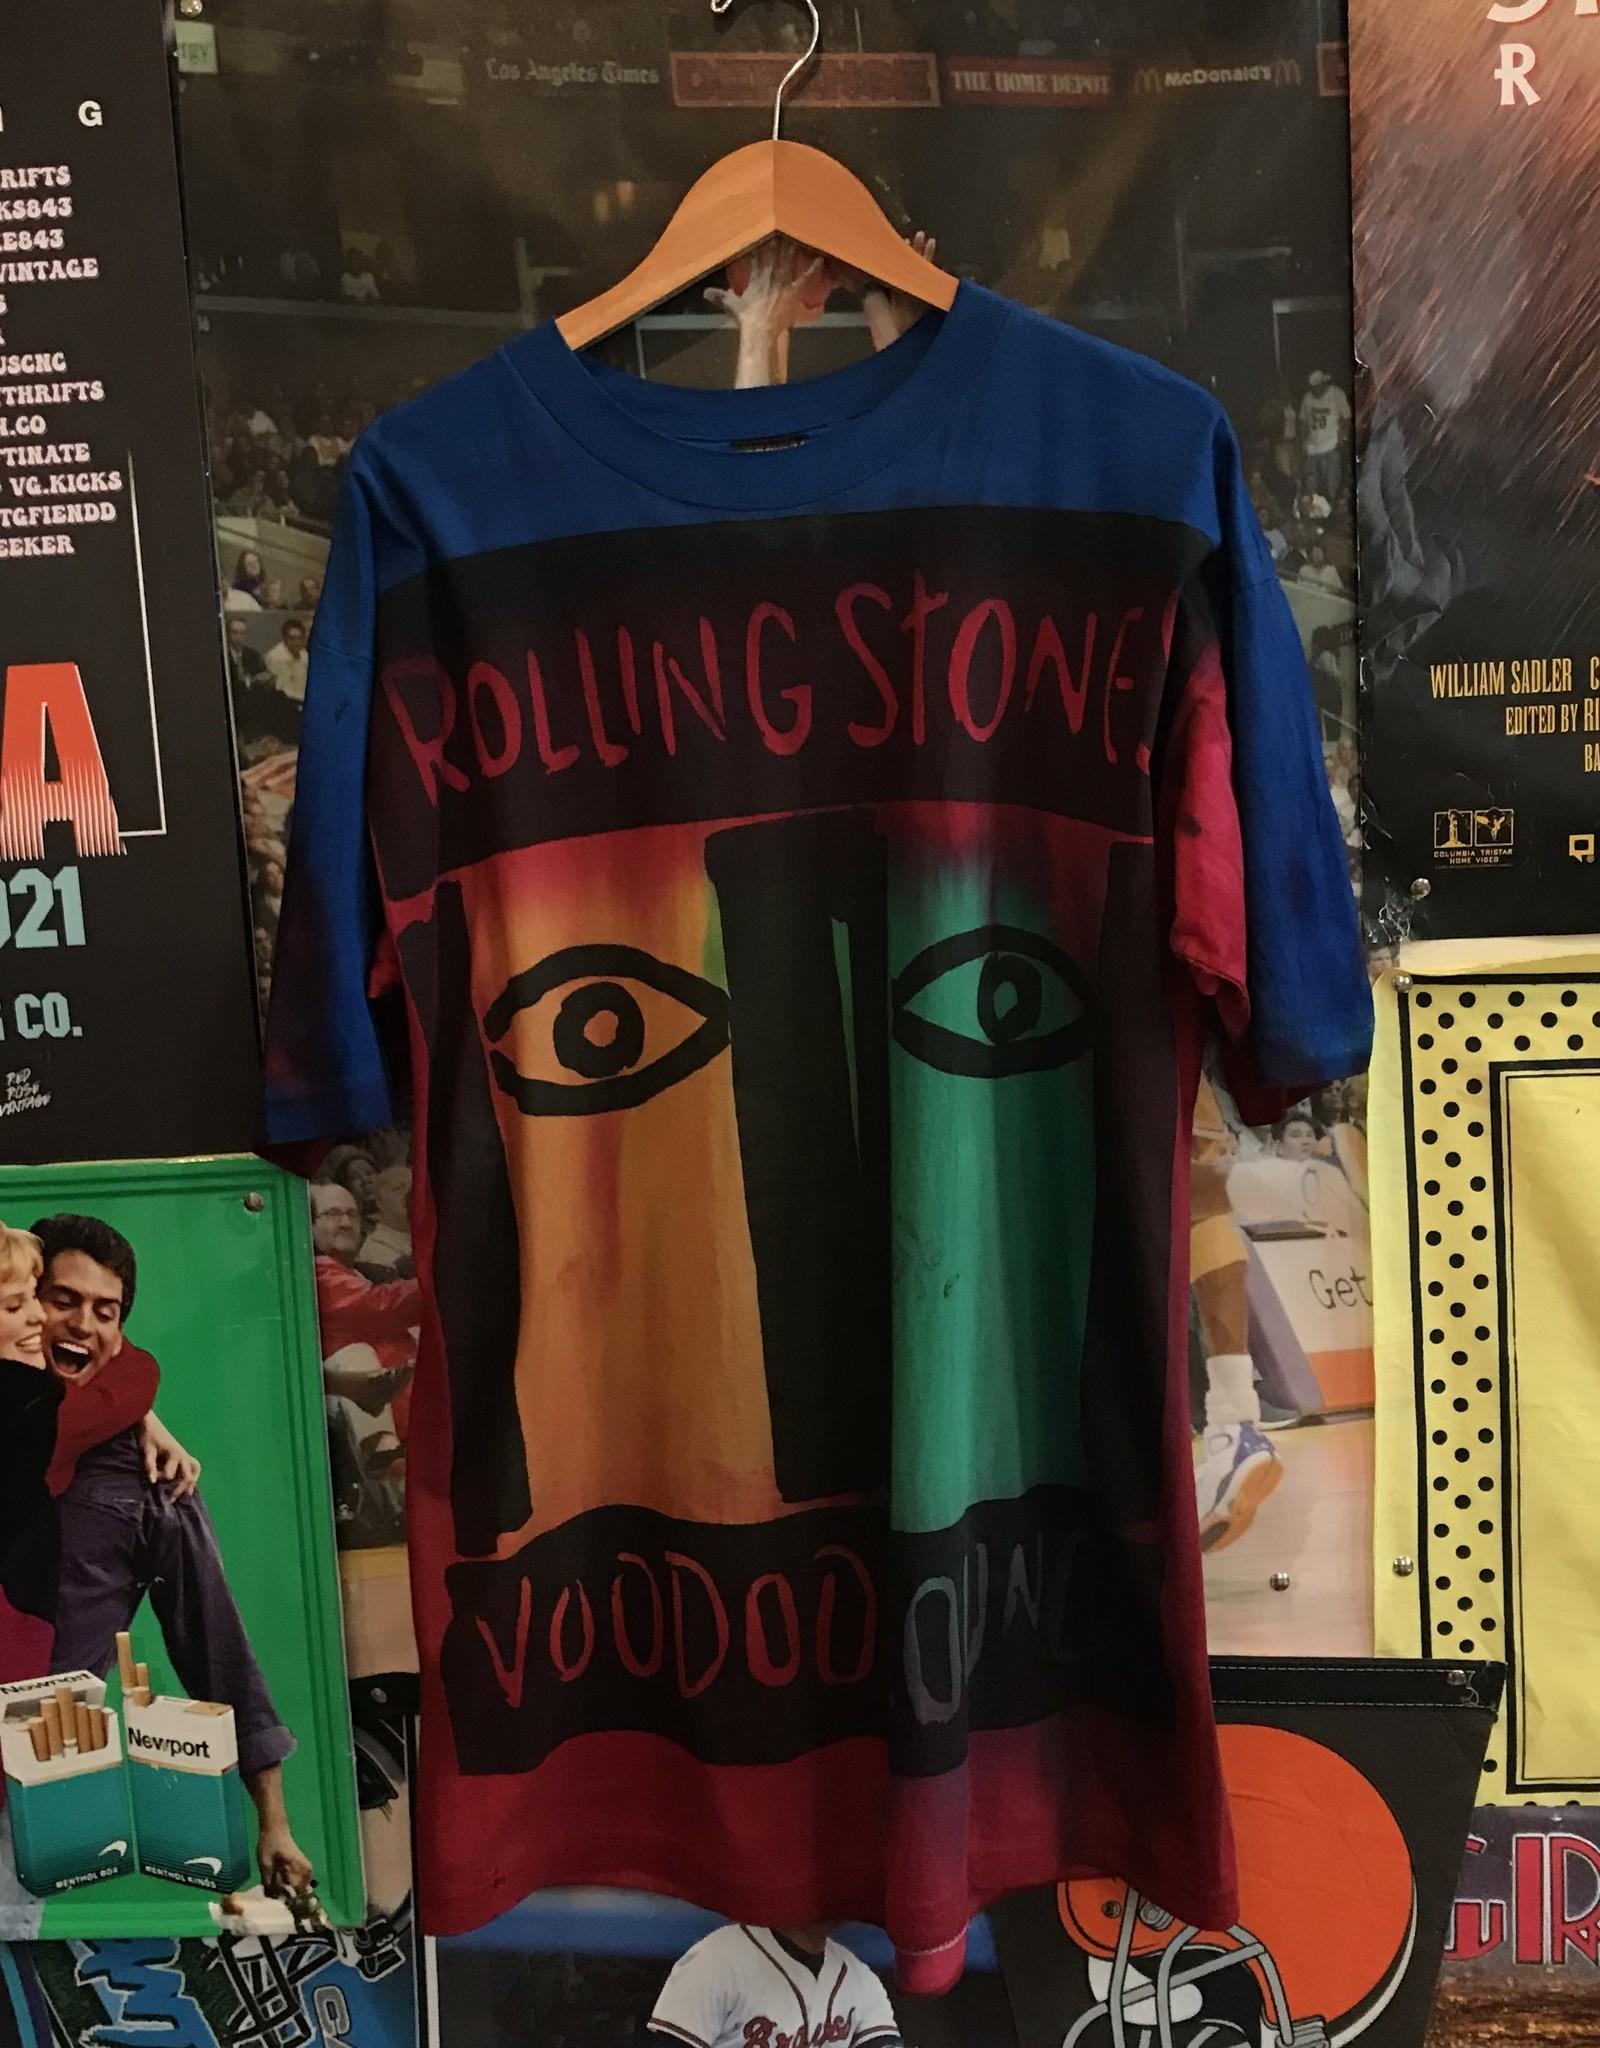 4147rolling stones voodoo lounge tie dye tee sz XL